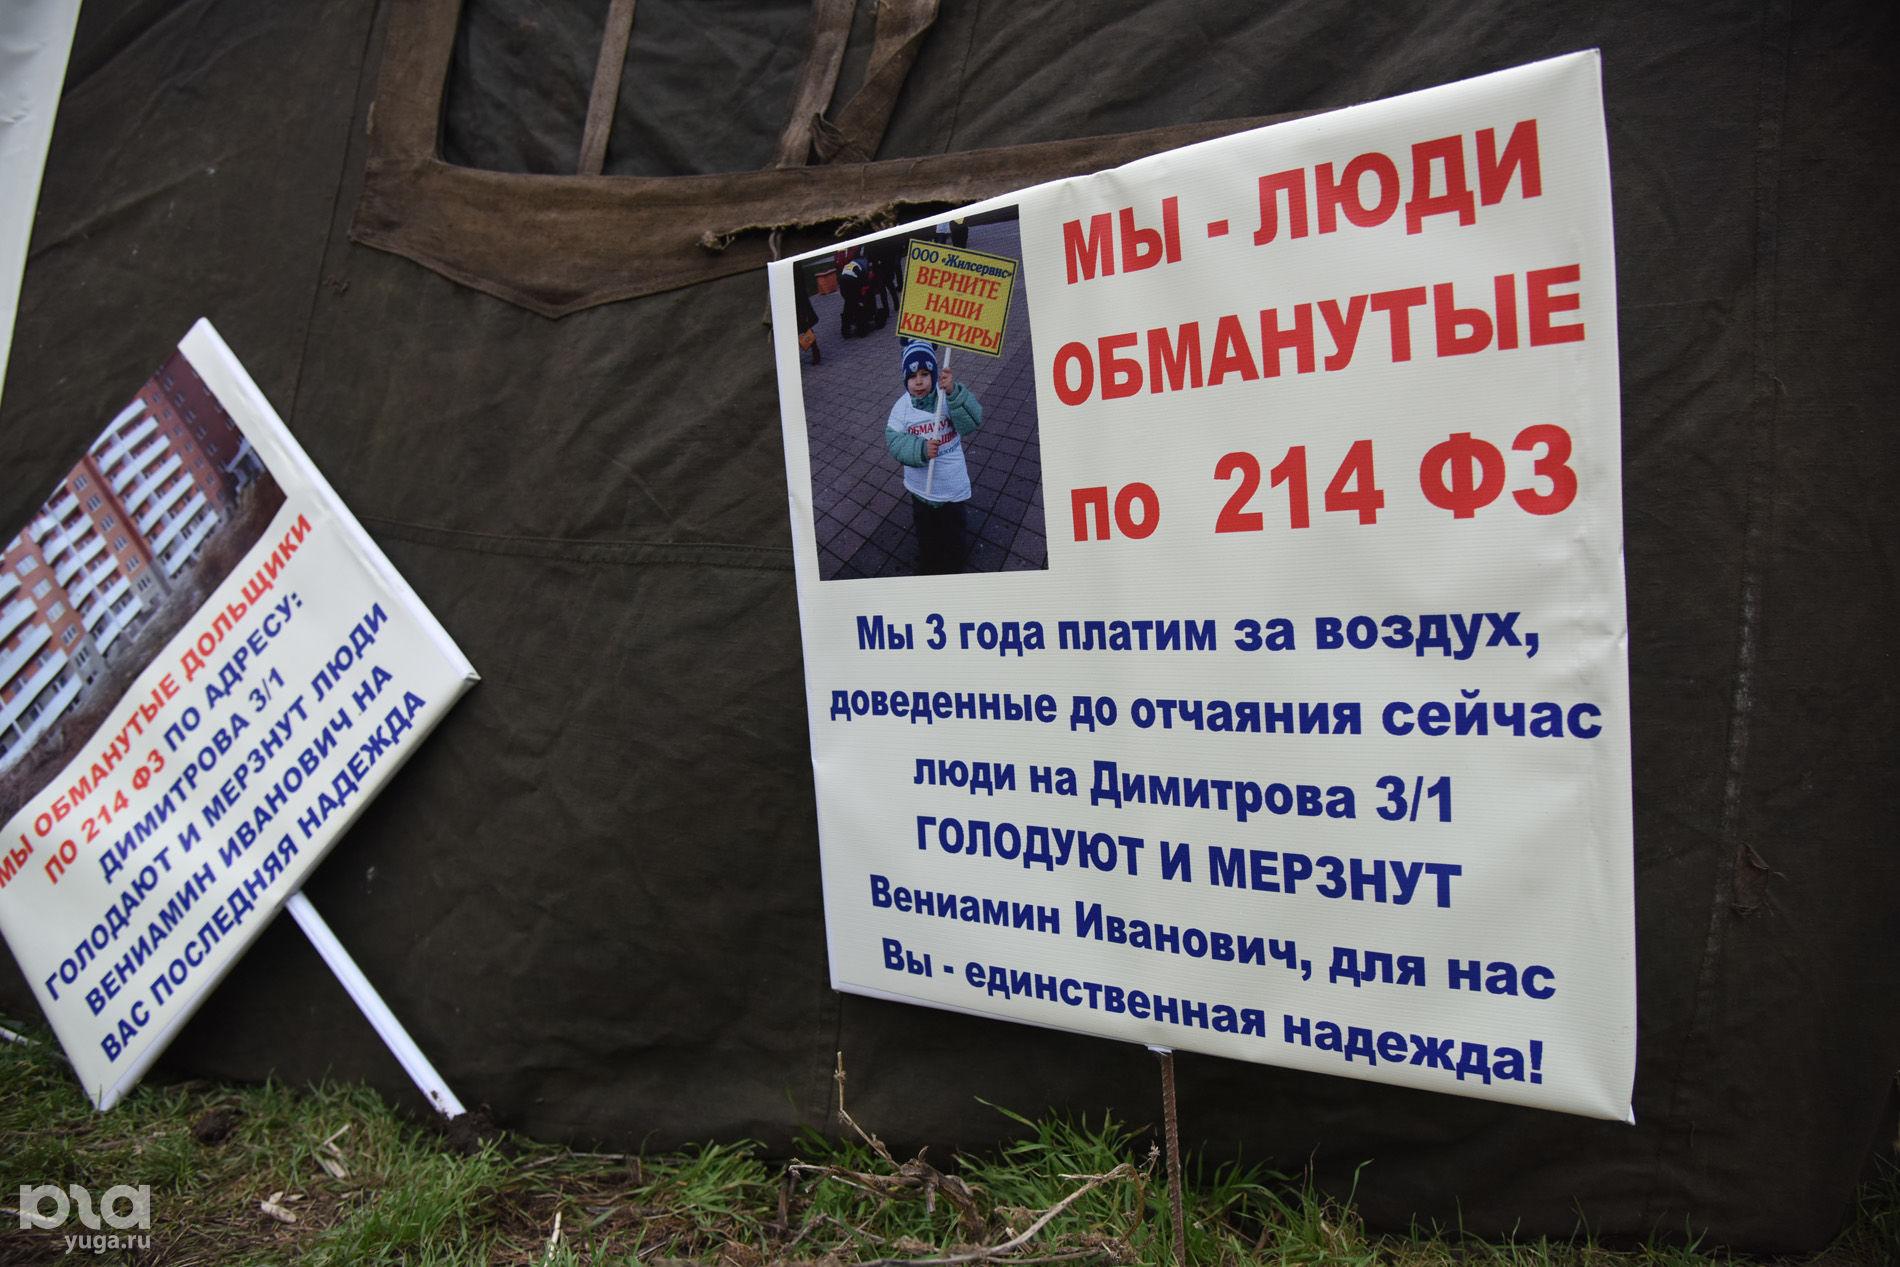 Дольщики многоквартирного дома на ул.Димитрова в Краснодаре объявили голодовку ©Елена Синеок, ЮГА.ру